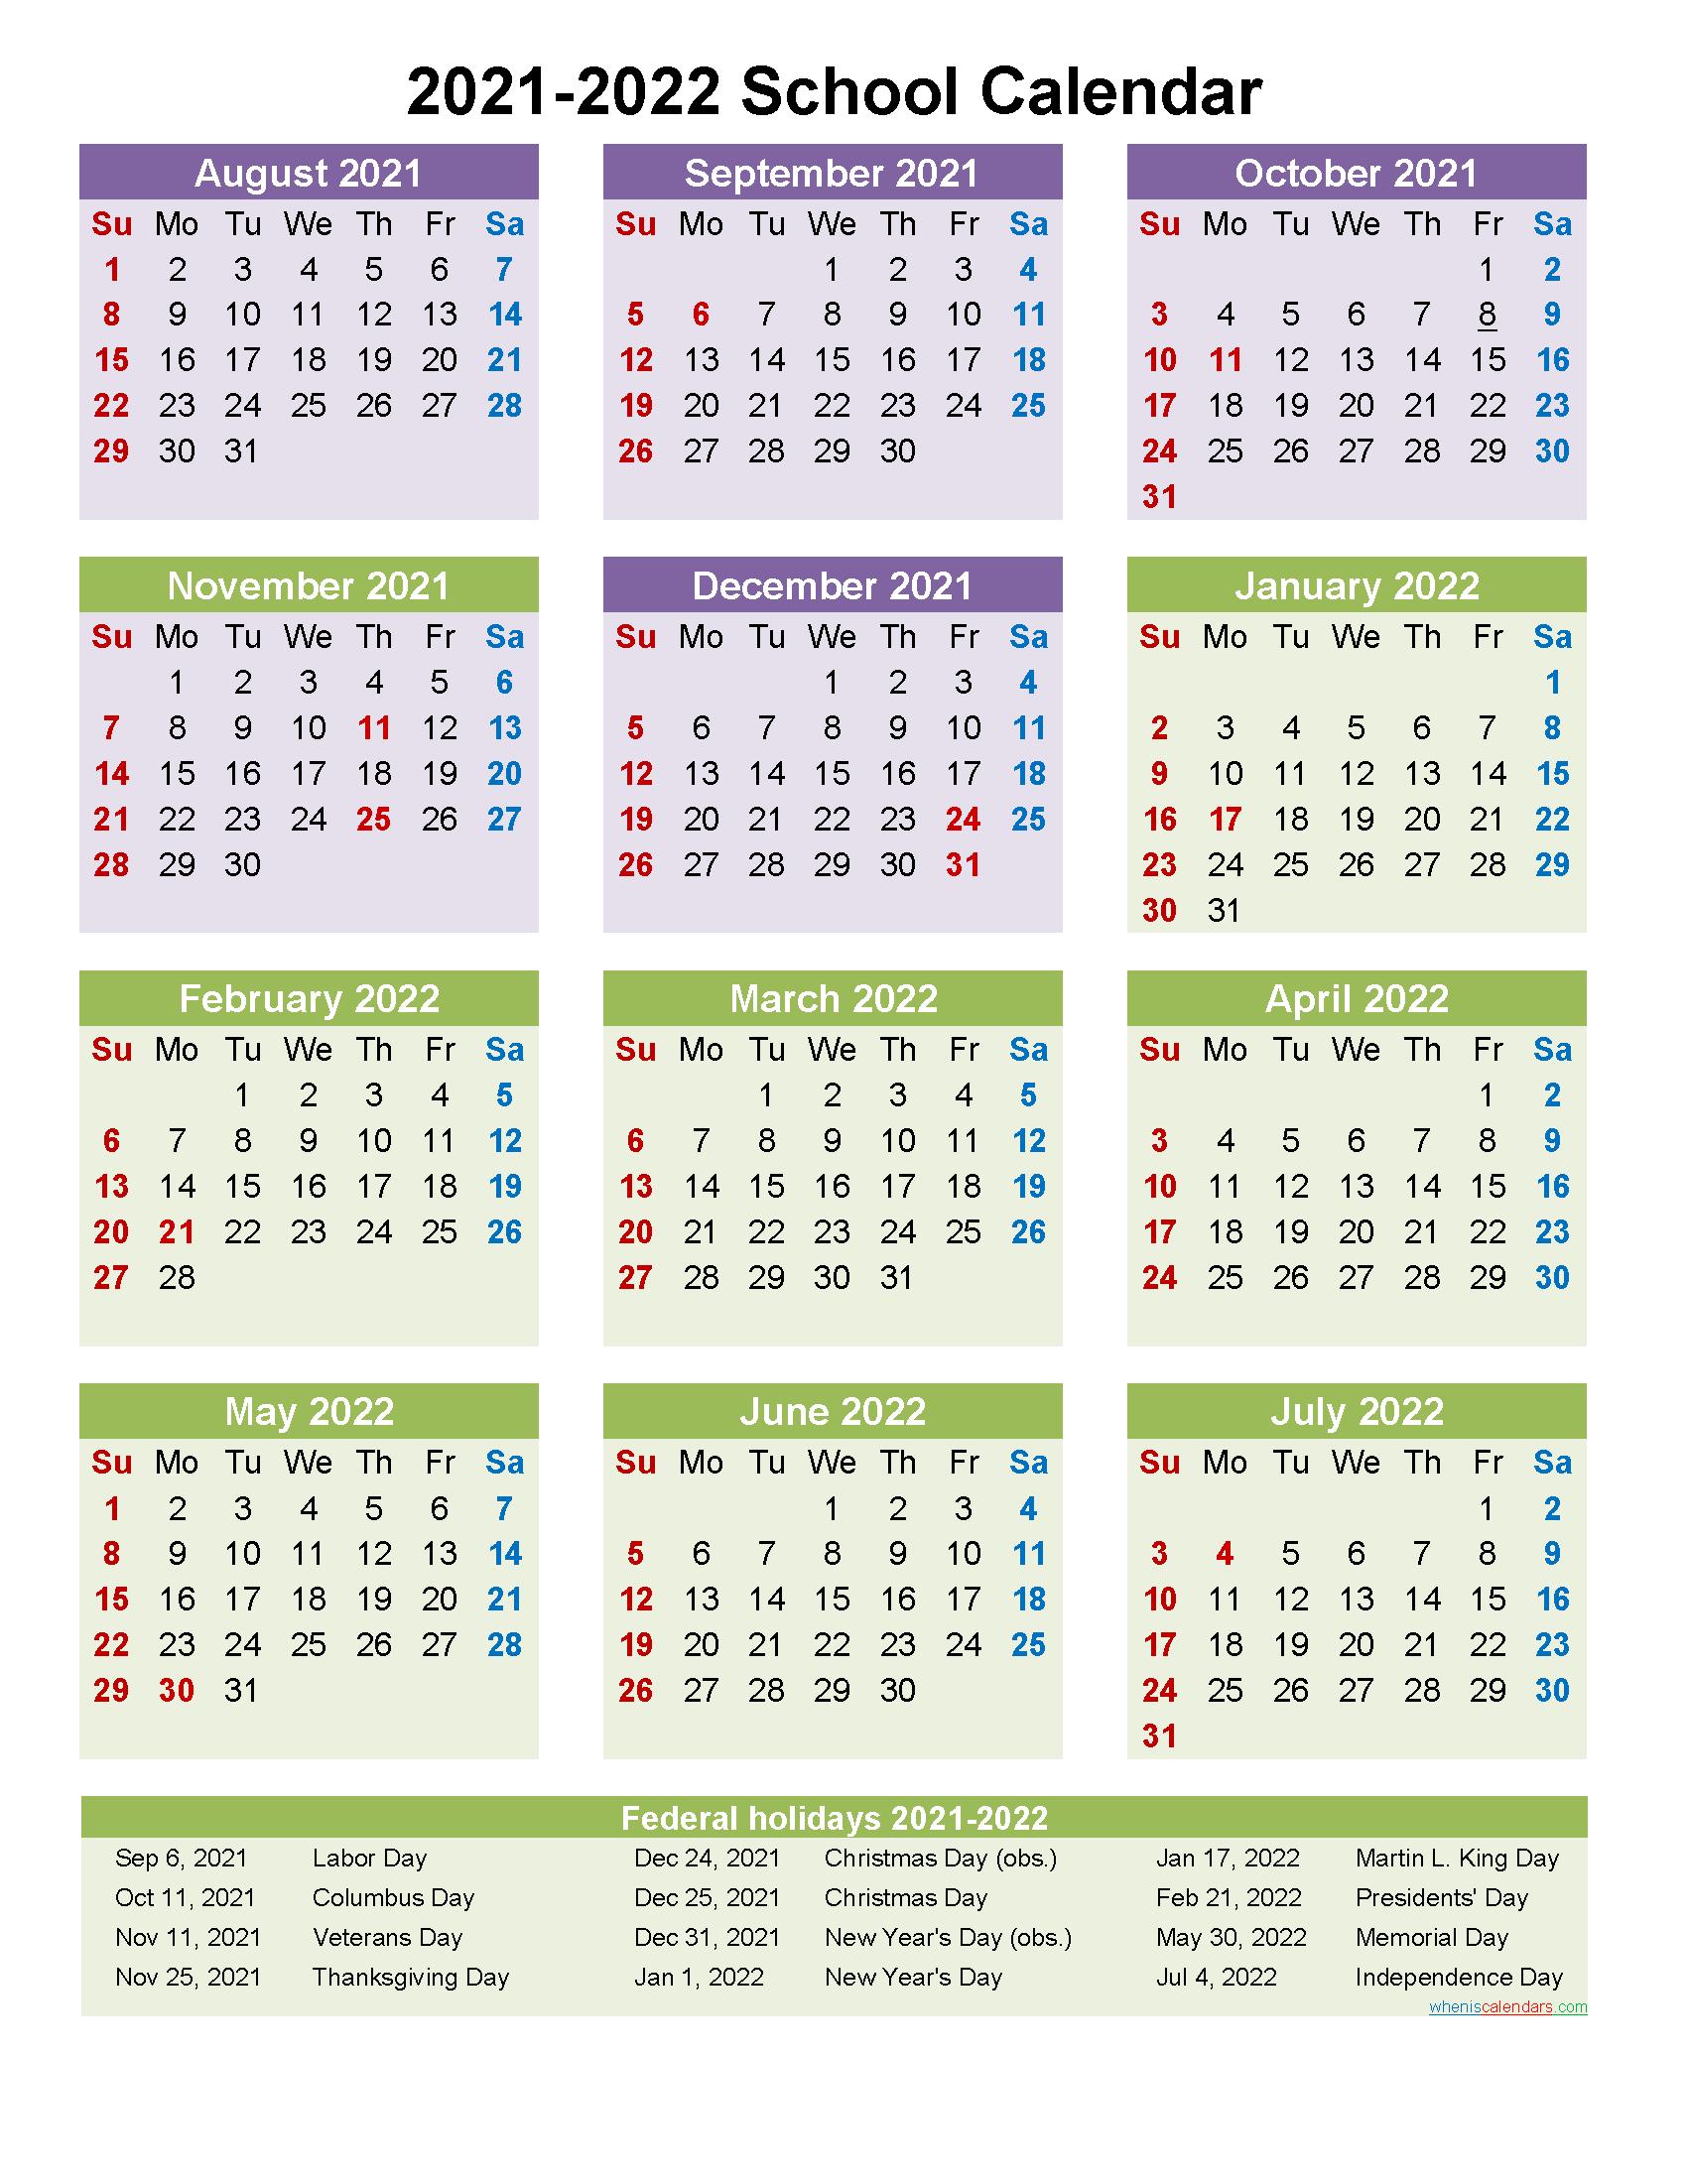 2021 and 2022 School Calendar Printable (Portrait ...